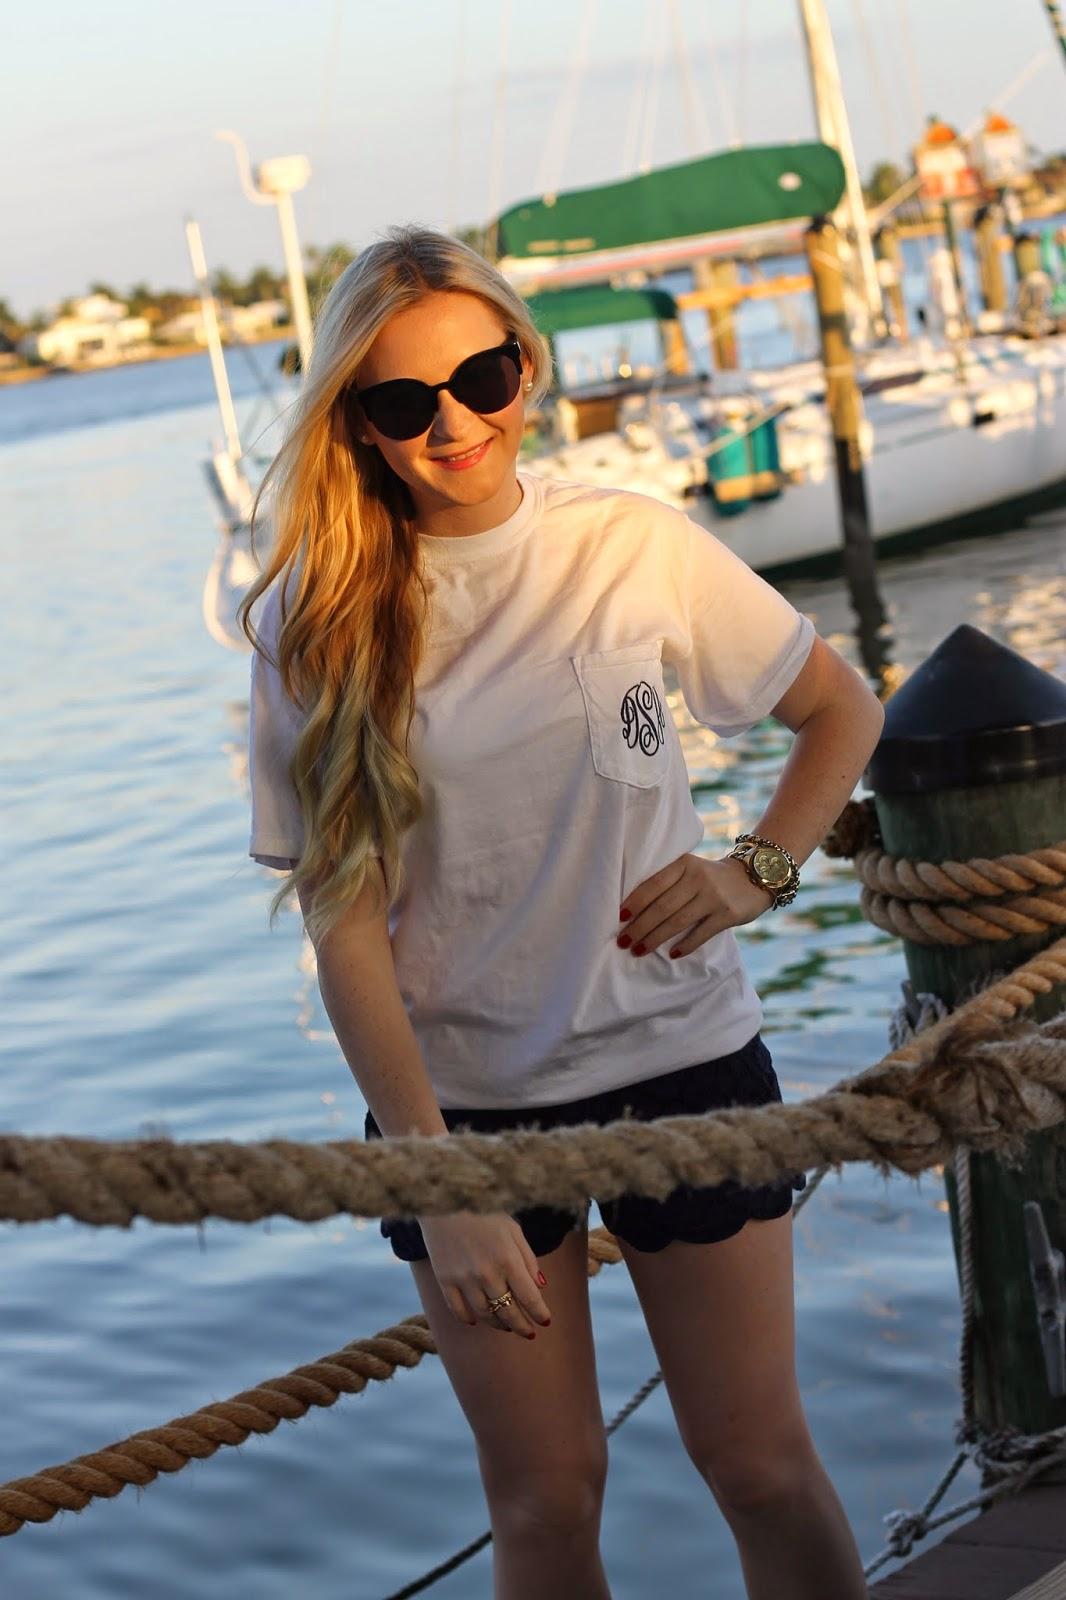 American Sailboat Pocket Shirts On The Dock Devon Alana